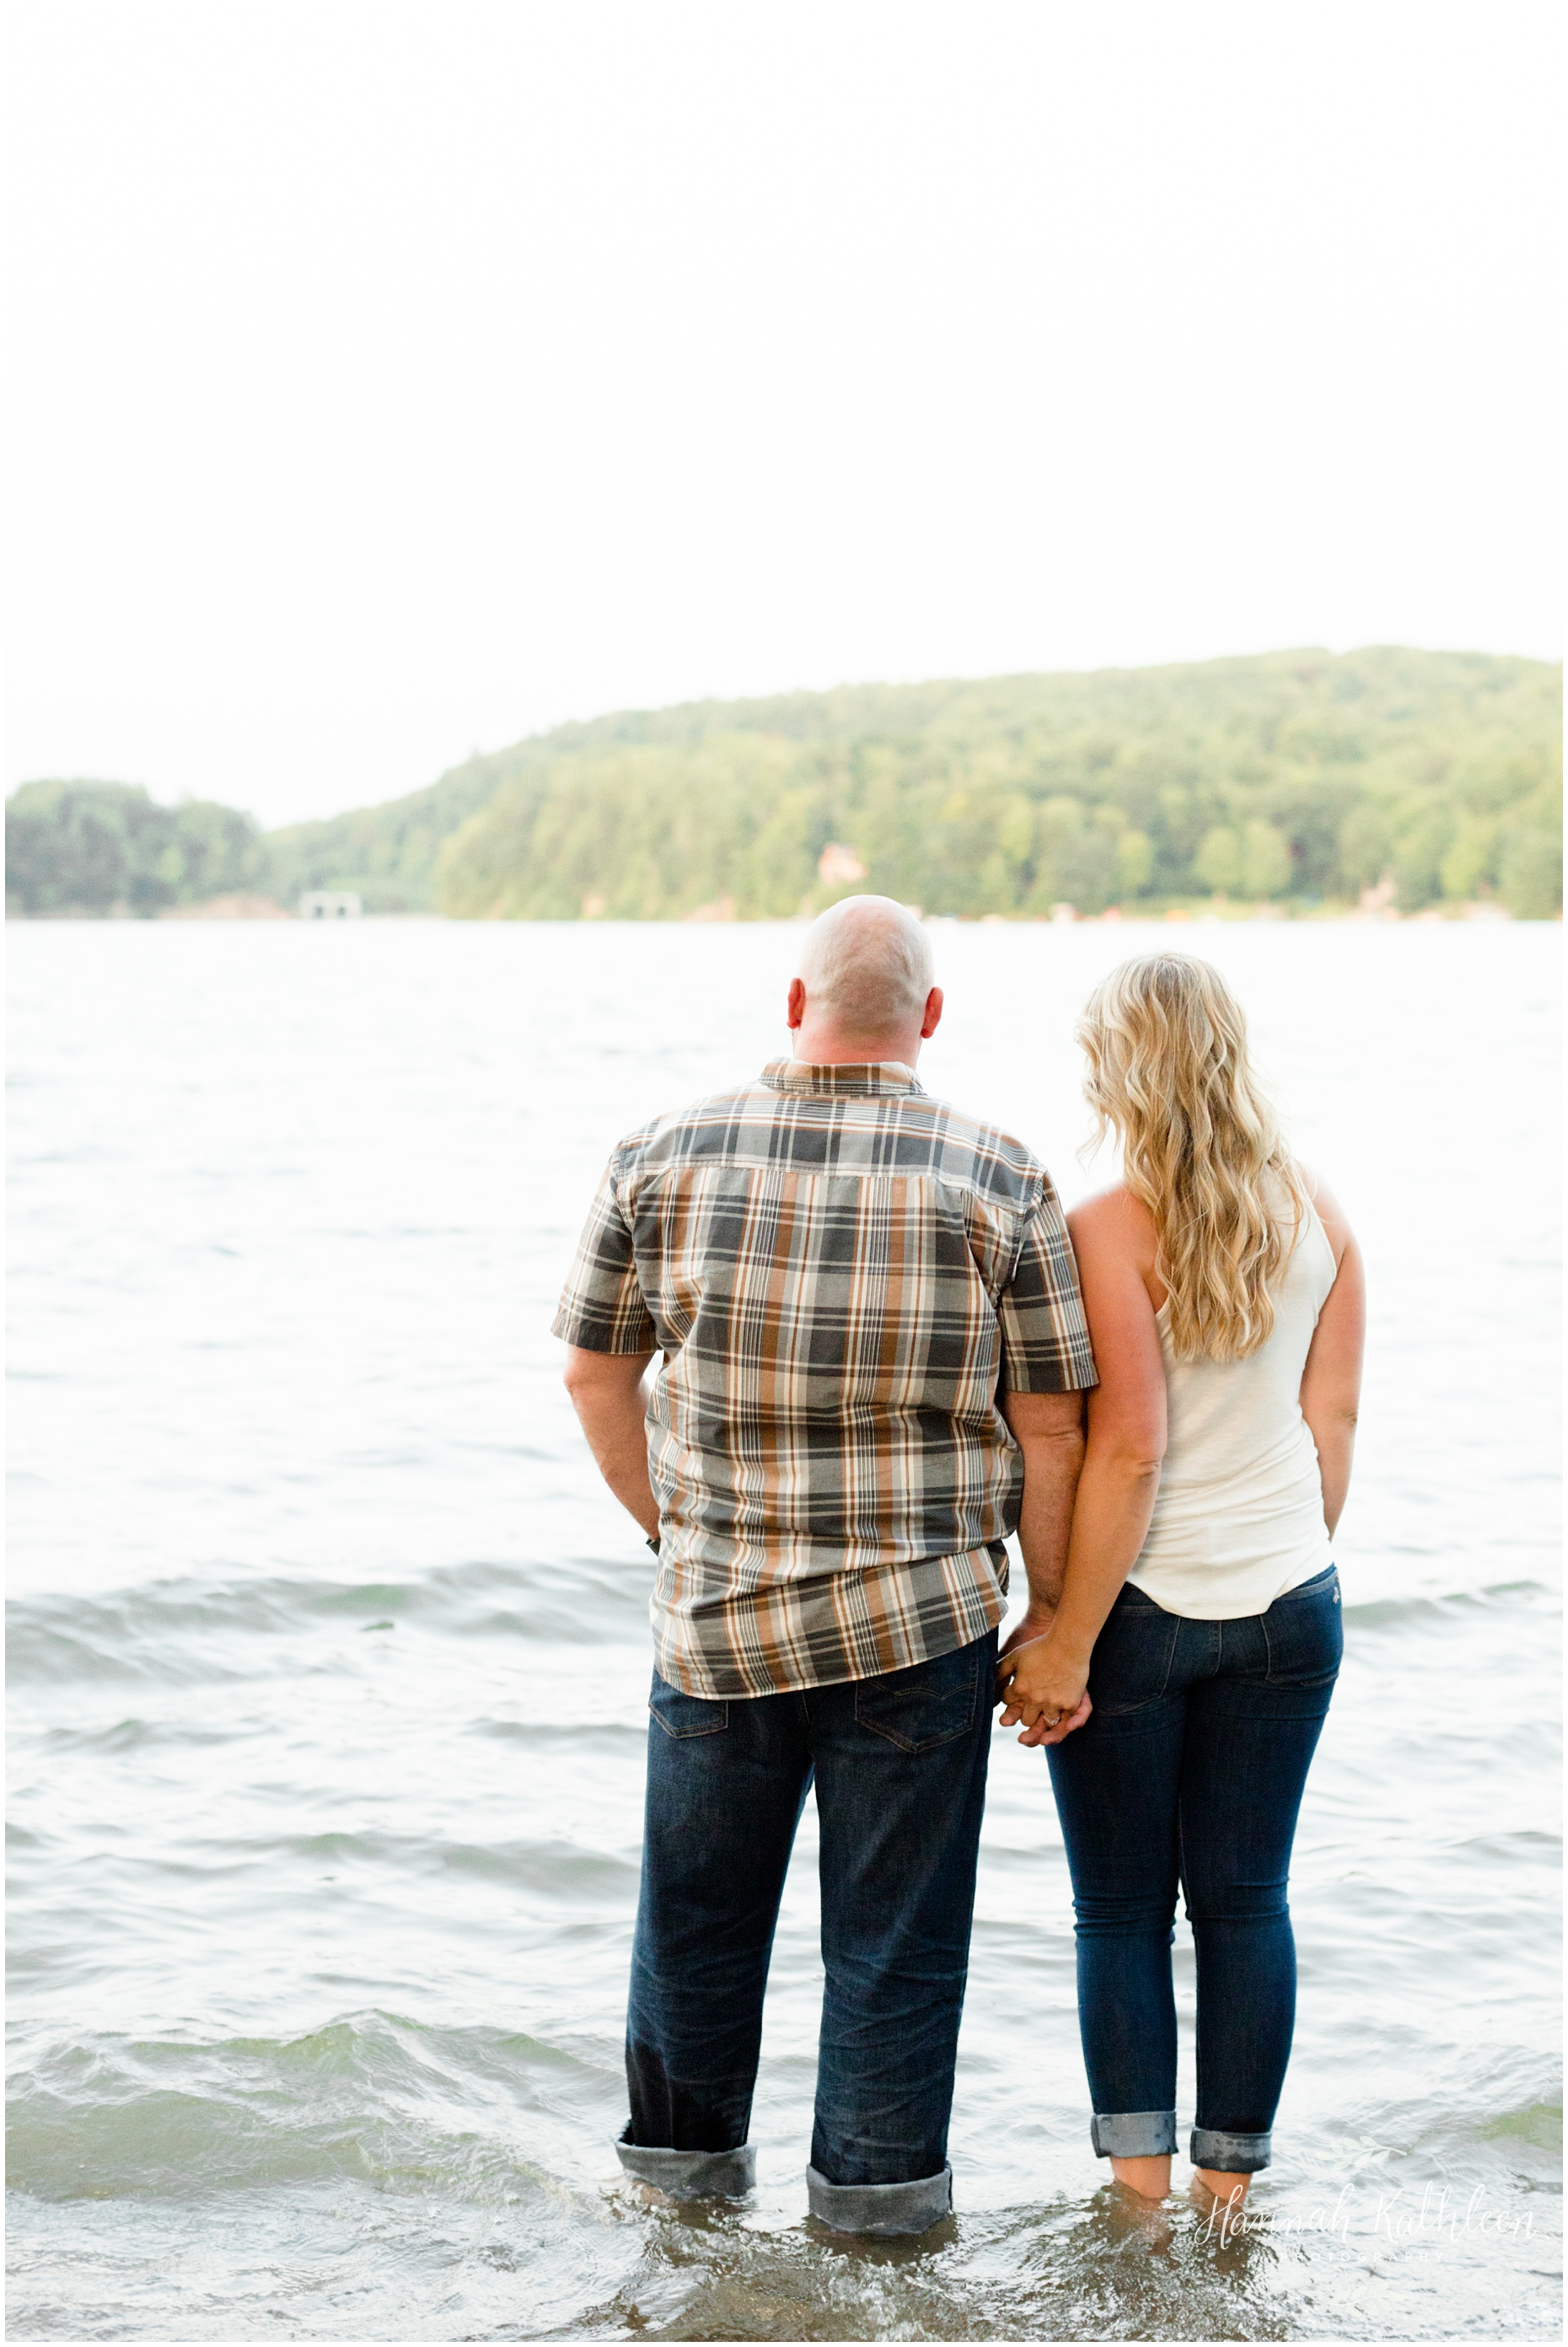 Karl_Alissa_Engagement_Rushford_Lake_Buffalo_NY_Photographer